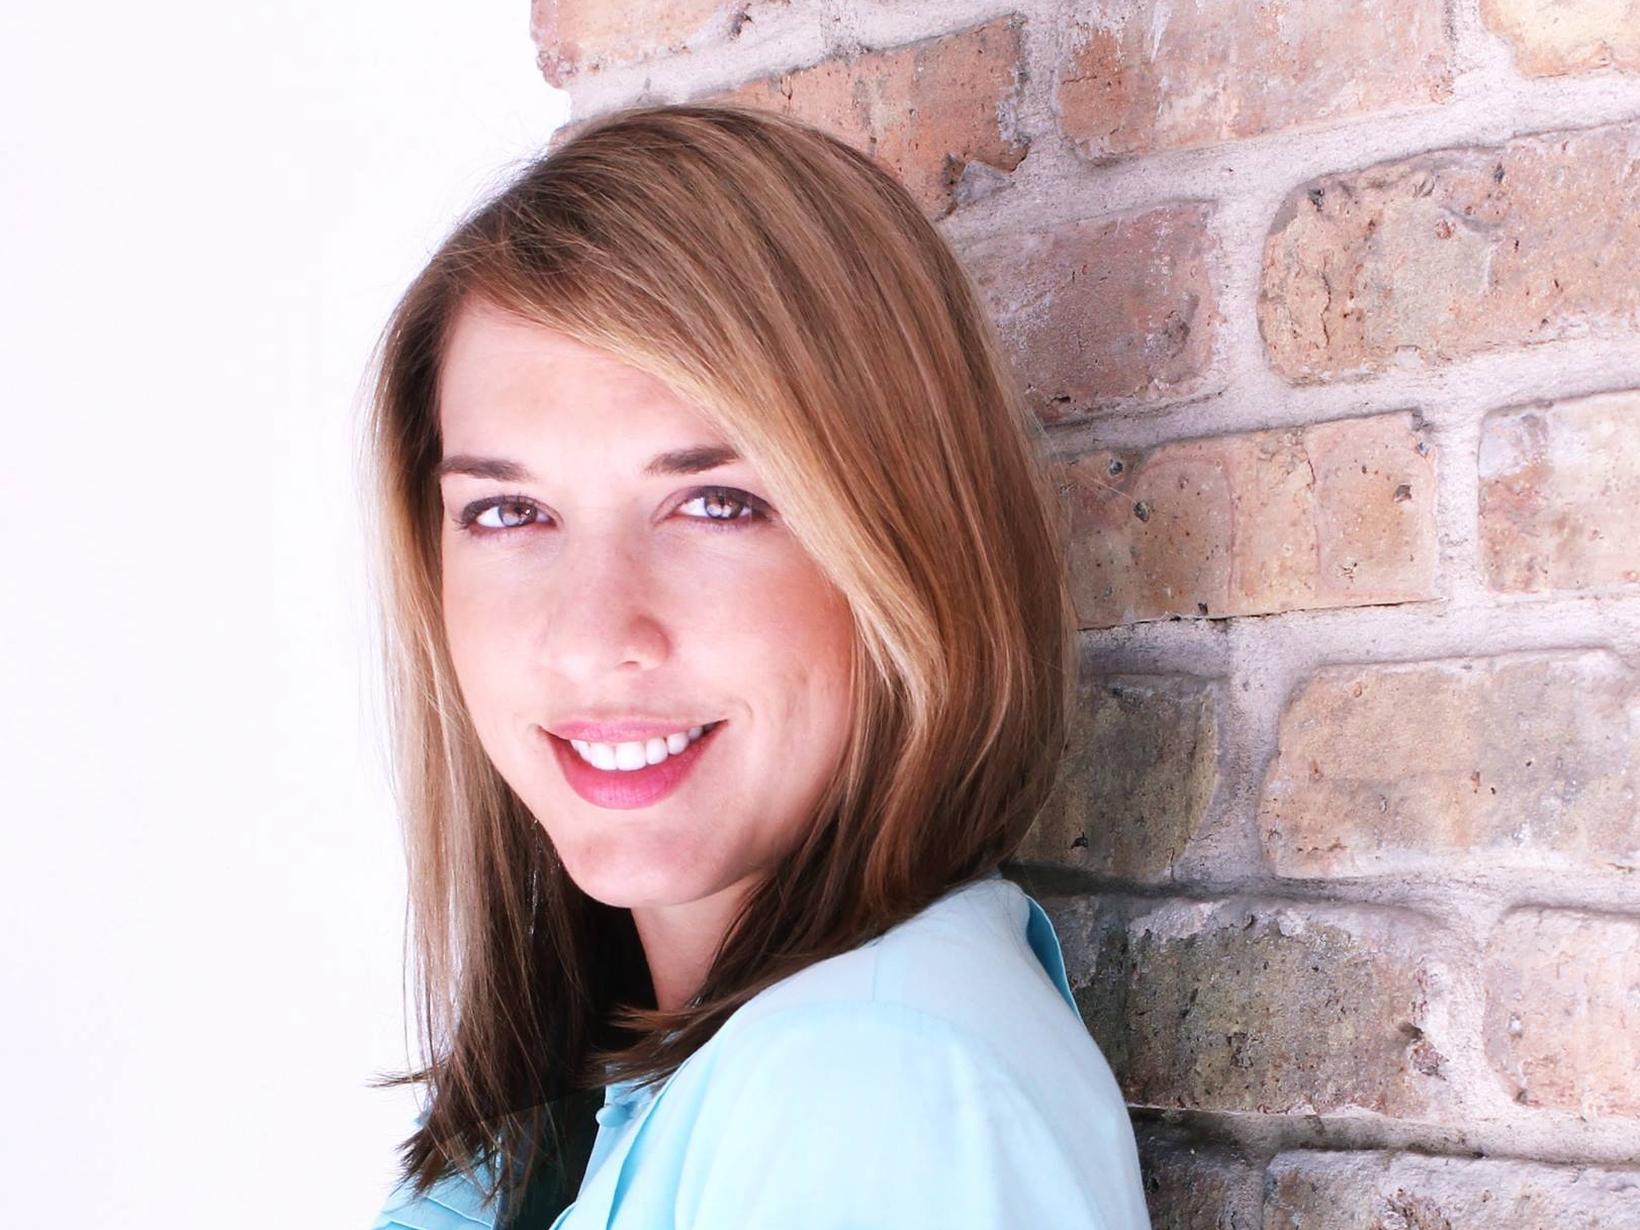 Megan from Austin, Texas, United States